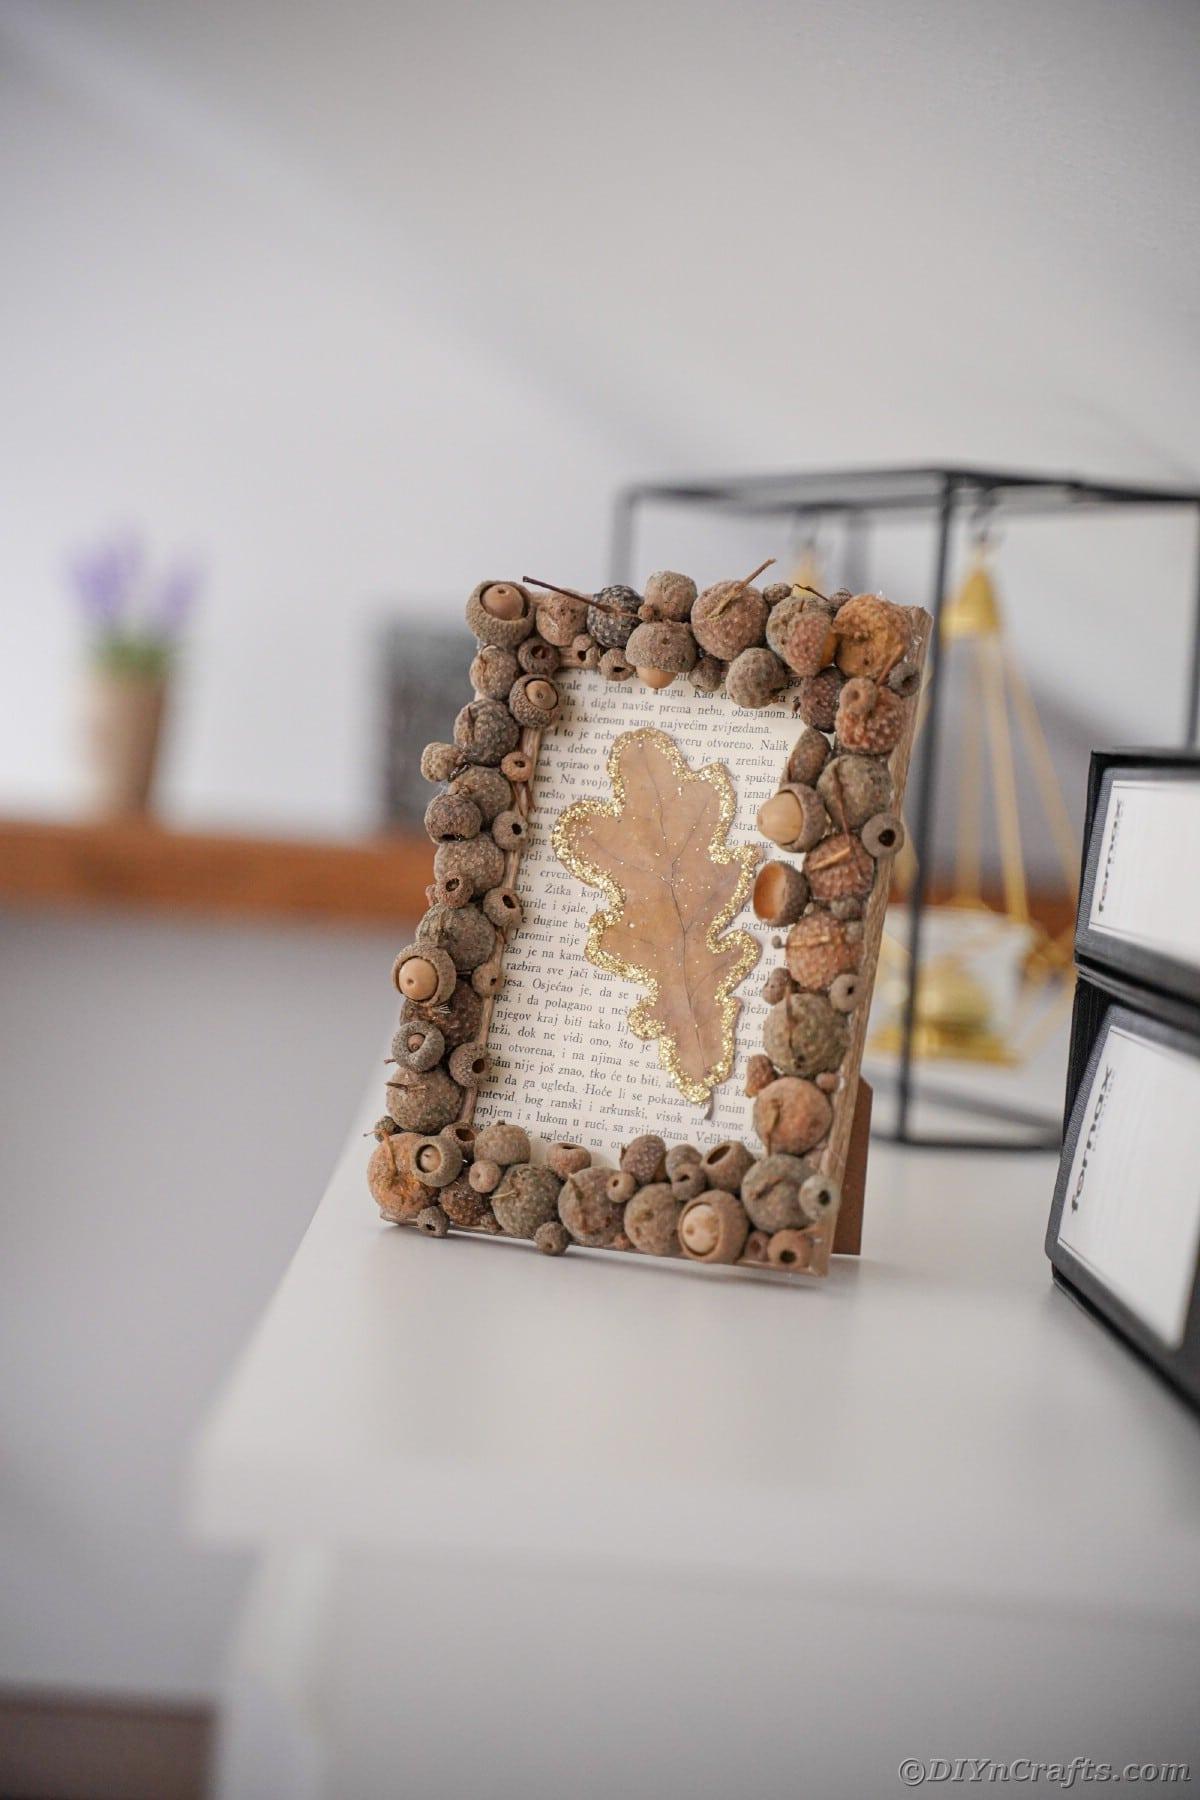 Acorn cap picture frame on white shelf